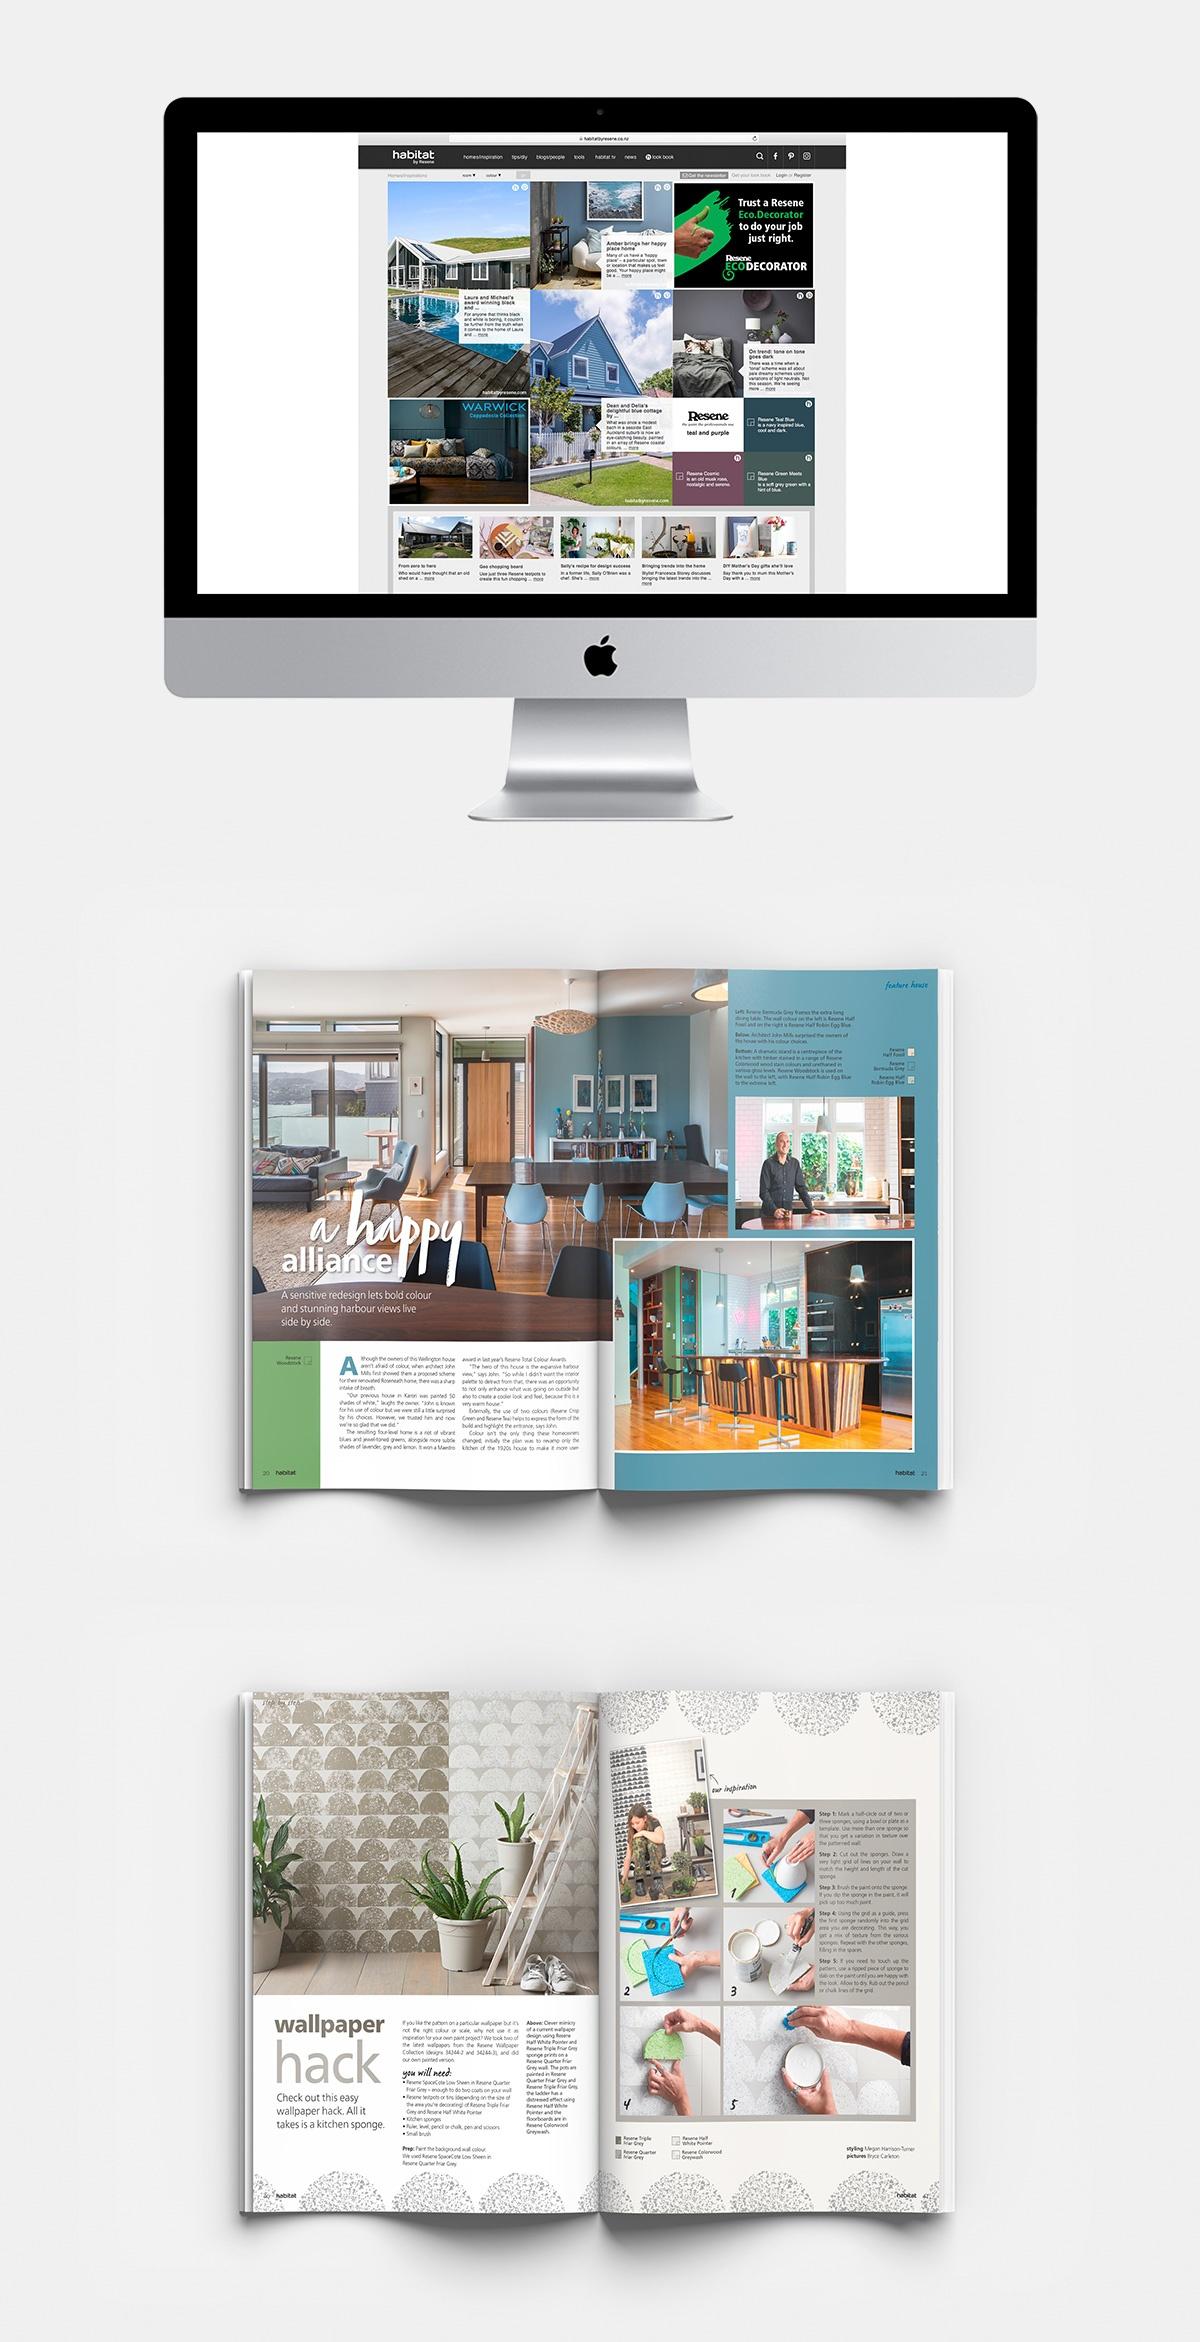 Habitat - A colorful magazine by Resene